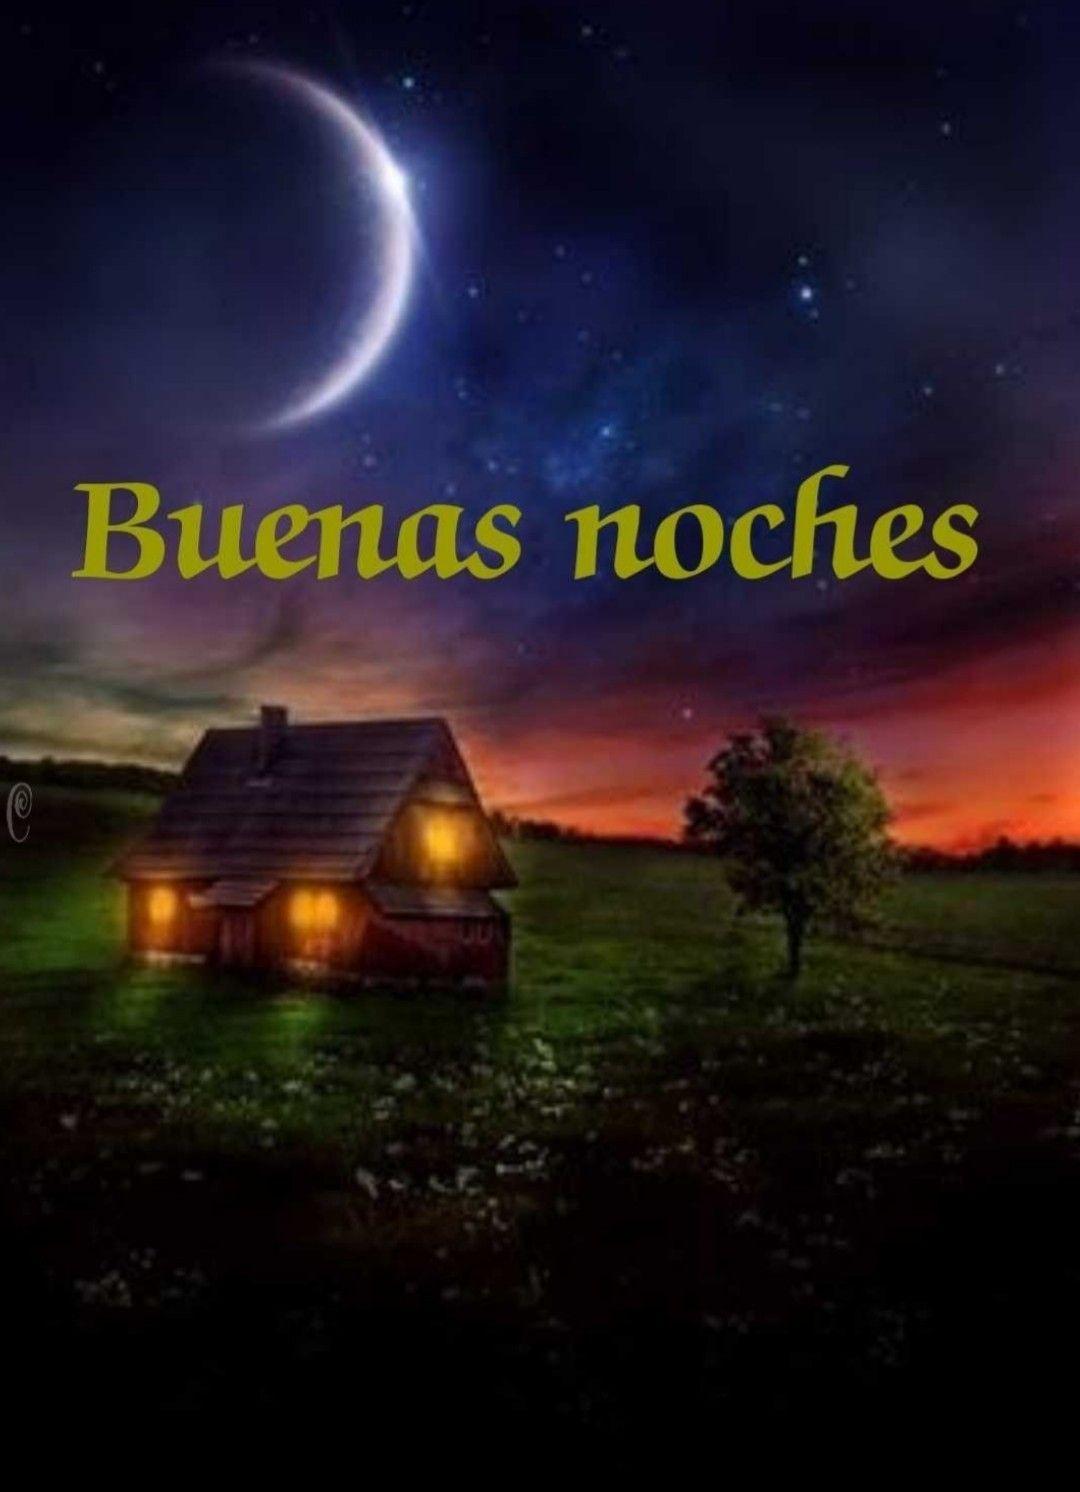 Pin De Alexander En Fondos Buenas Noches Meme Buenas Noches Animadas Buenas Noches Frases